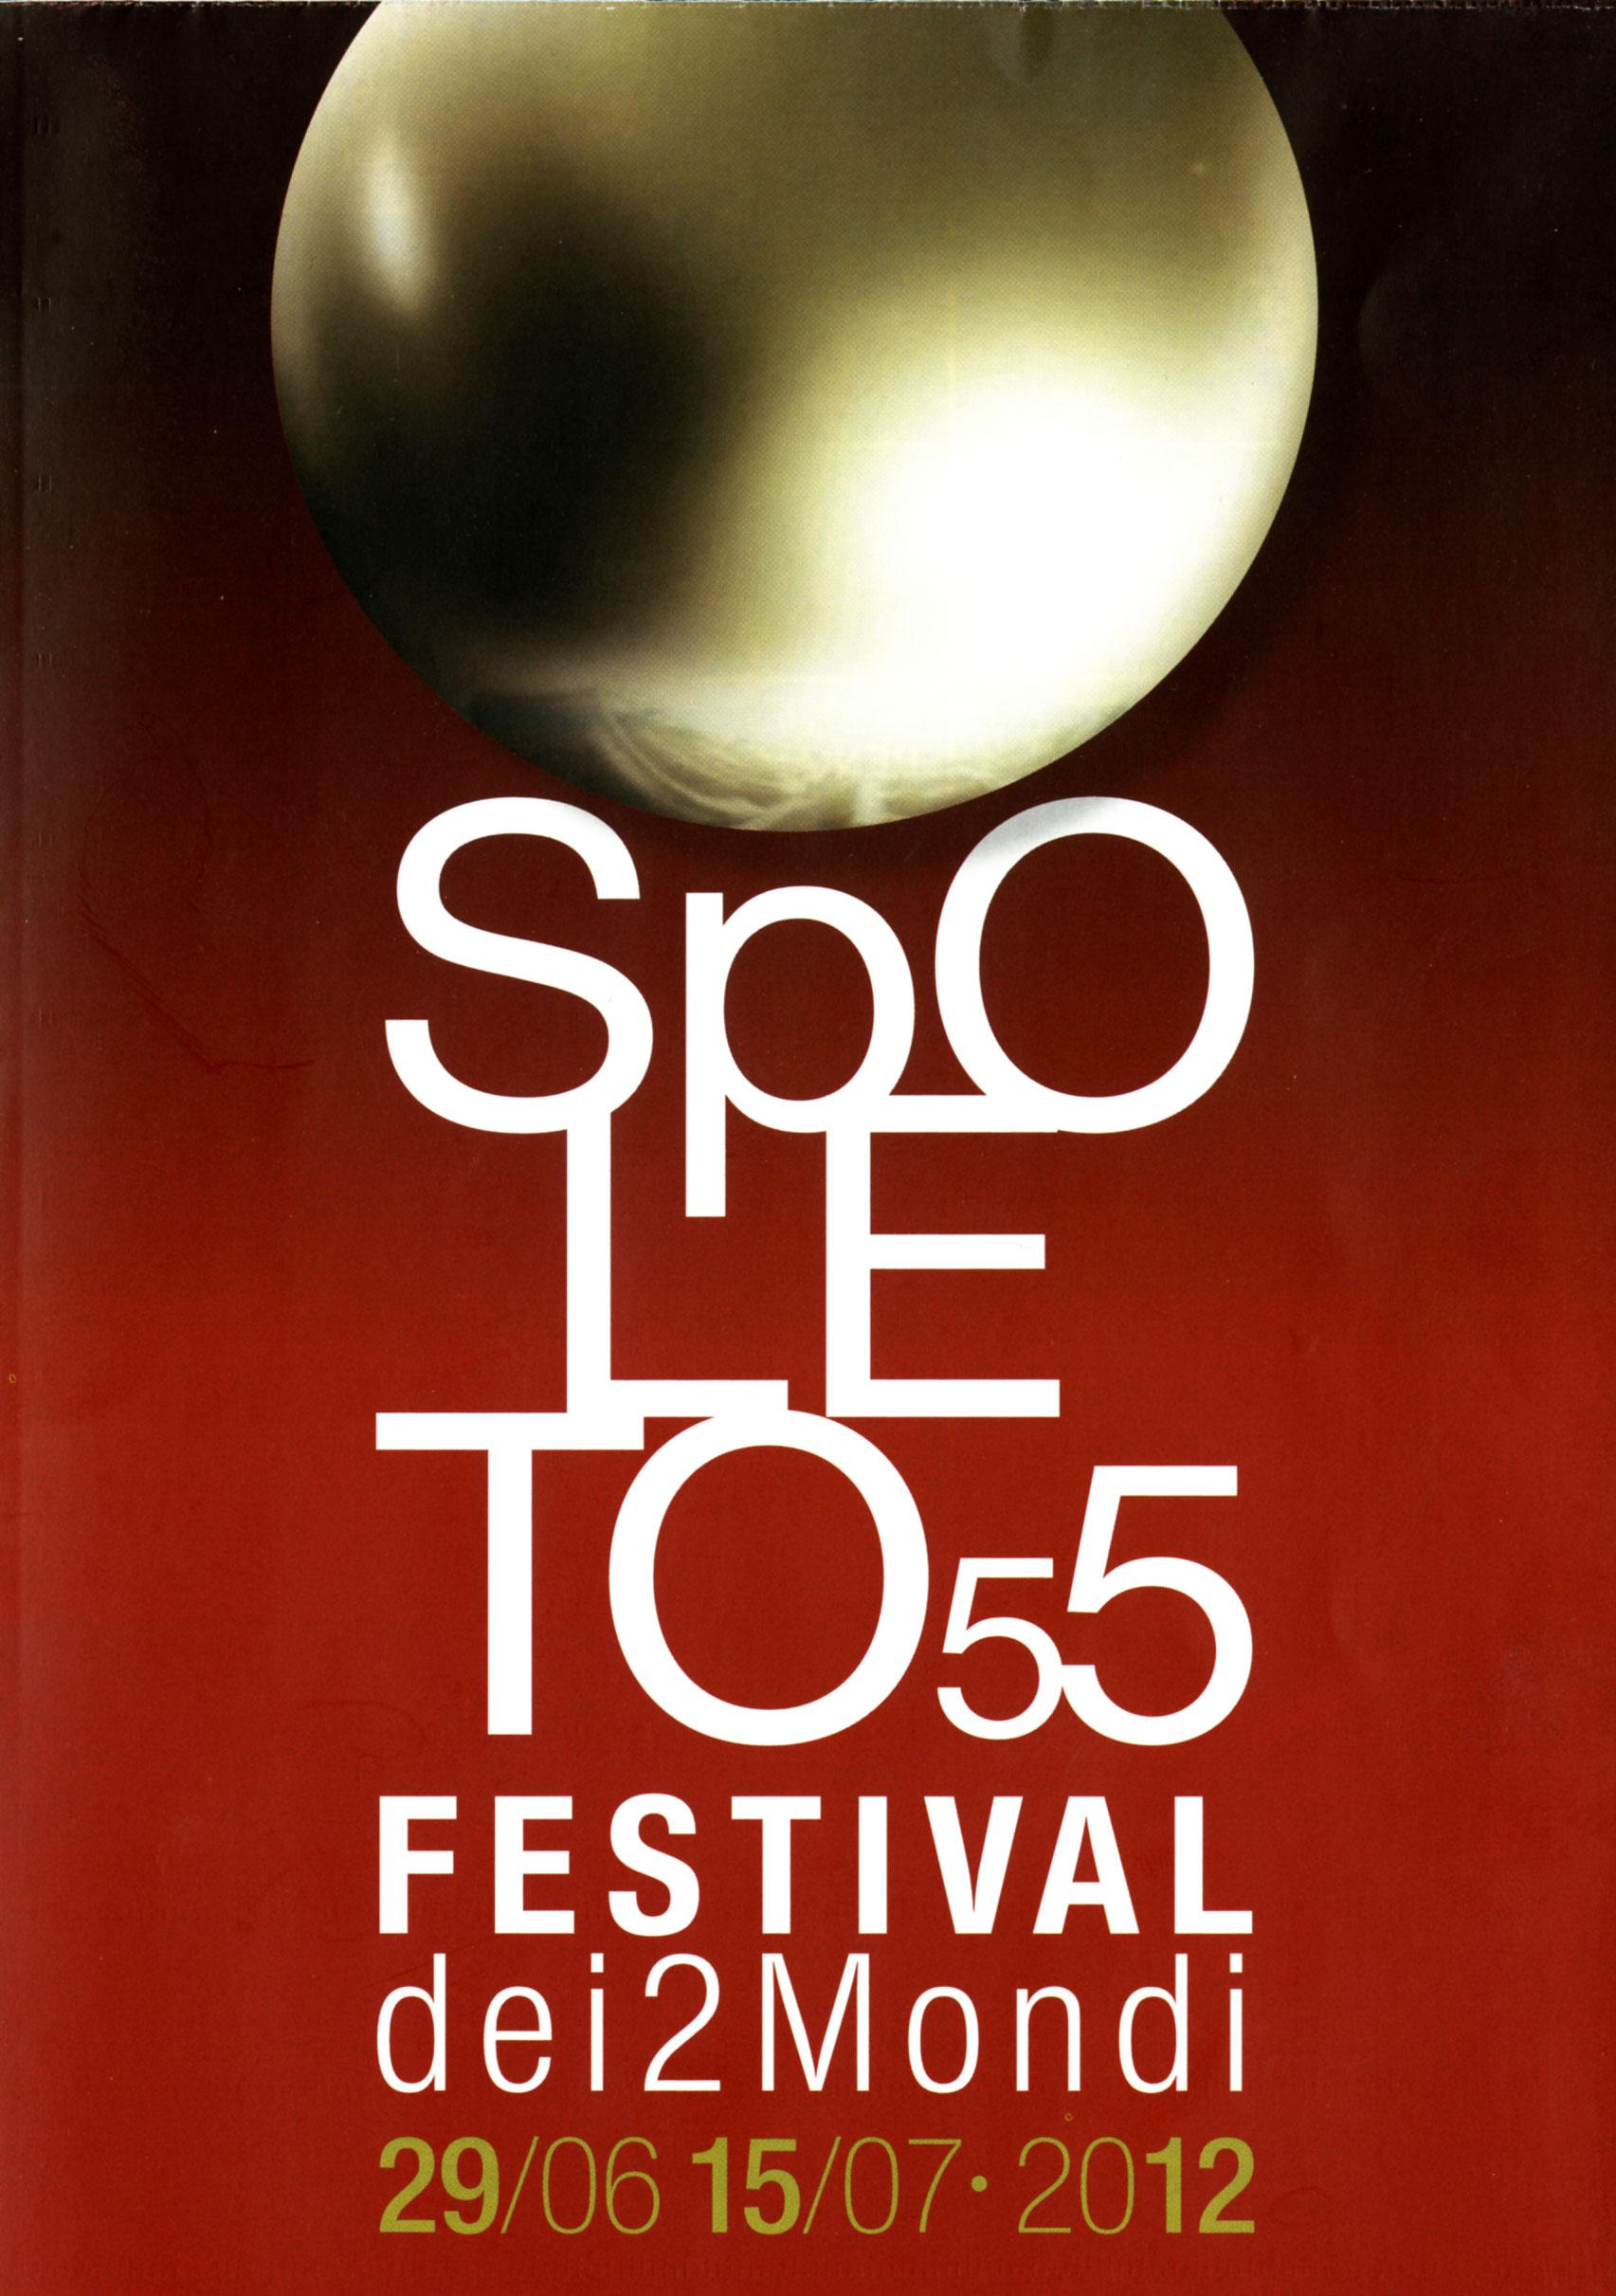 Festival dei Due Mondi a Spoleto